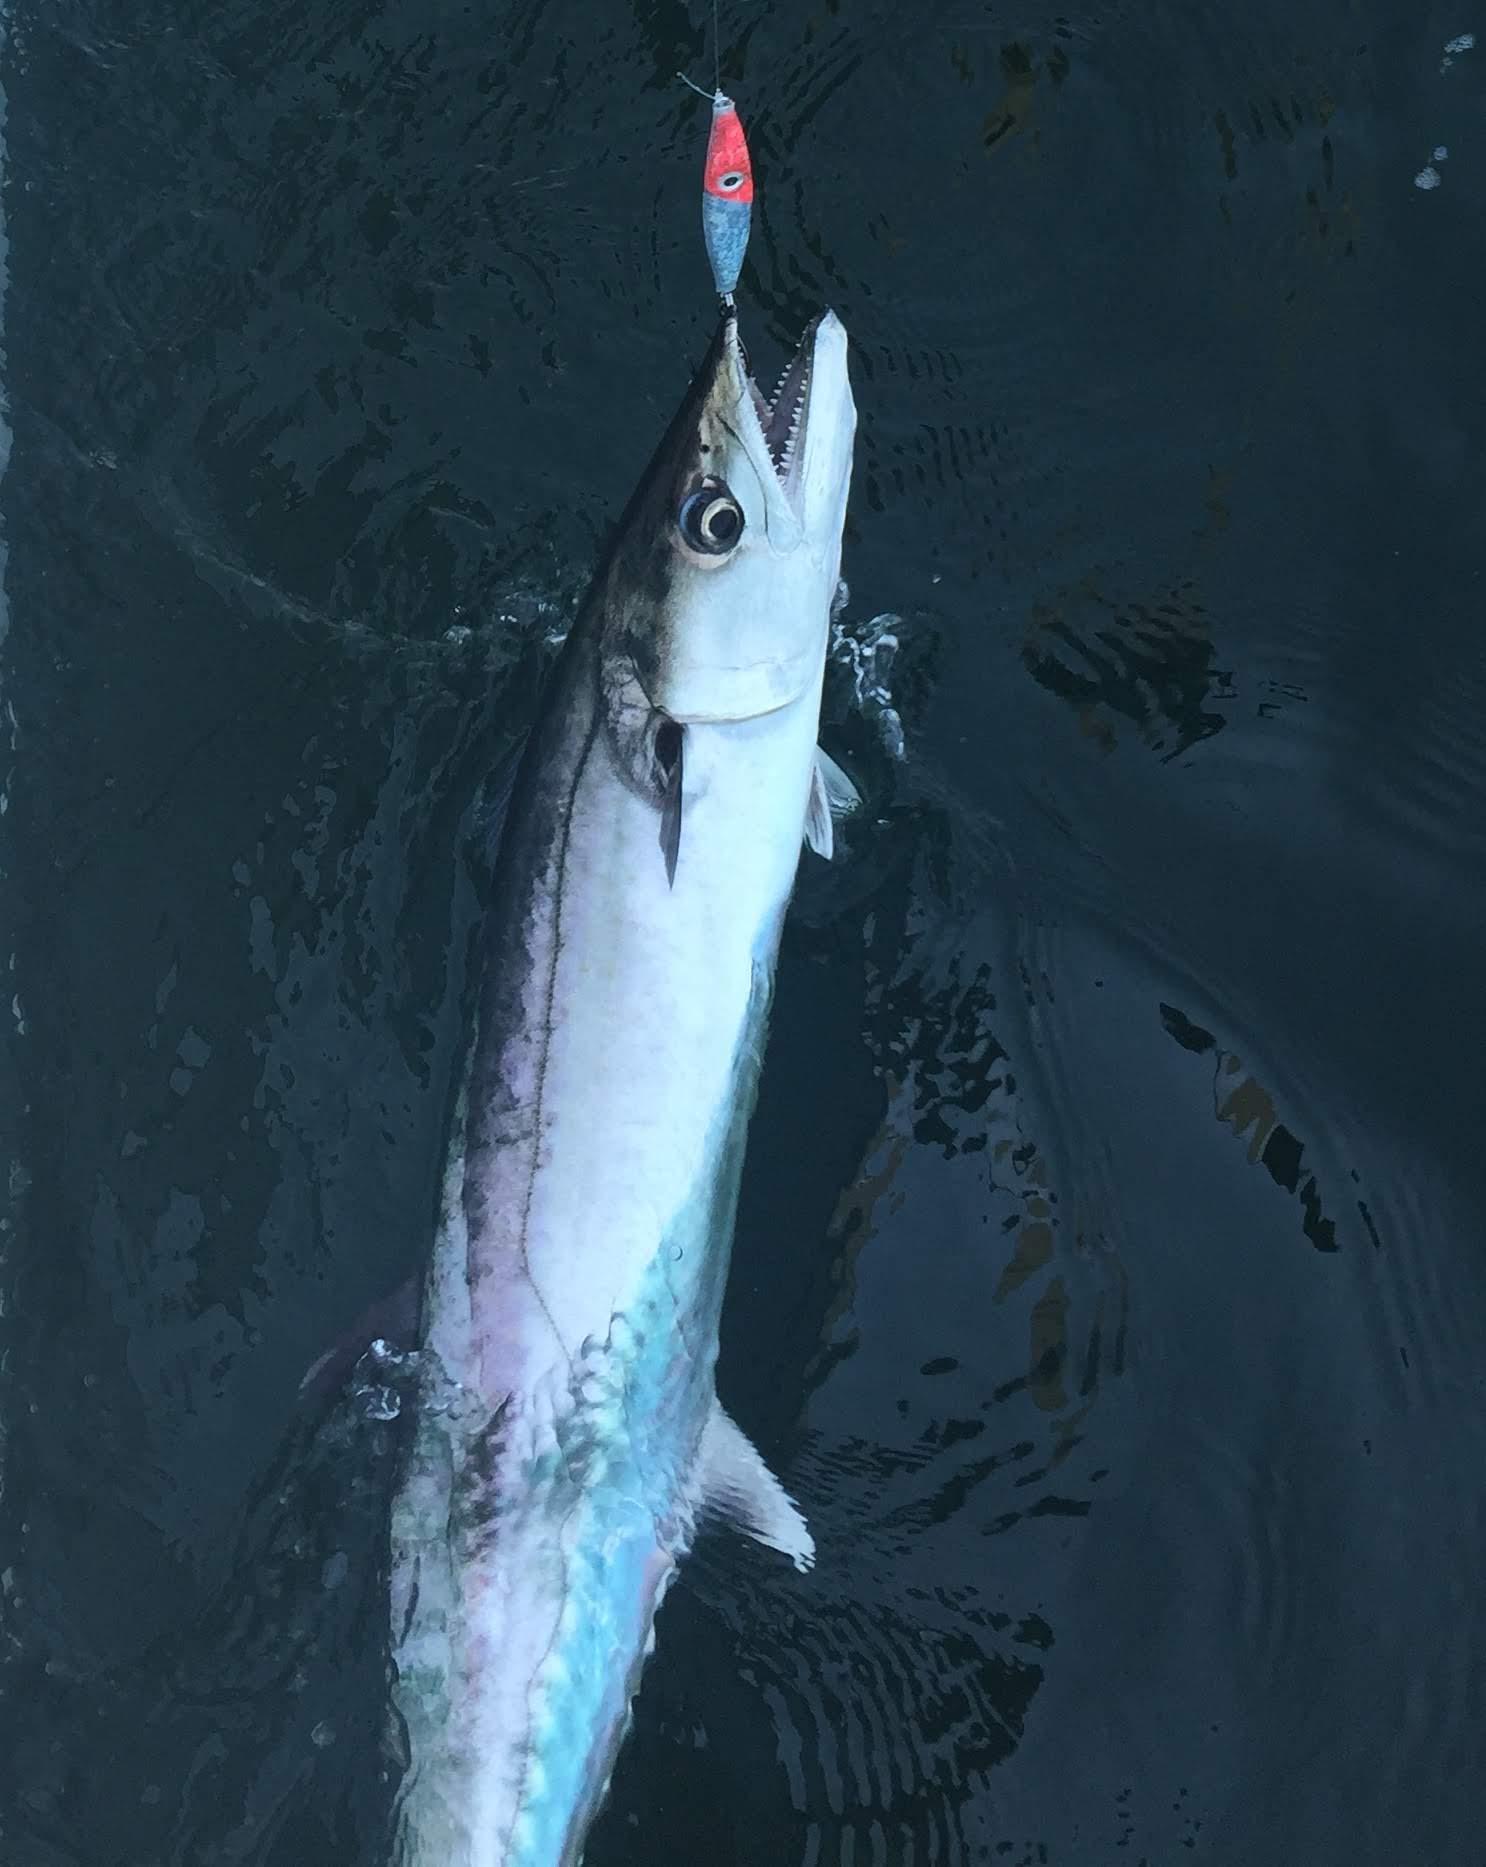 King Mackerel 3 oz Fluorescent Pink Glow. RHB